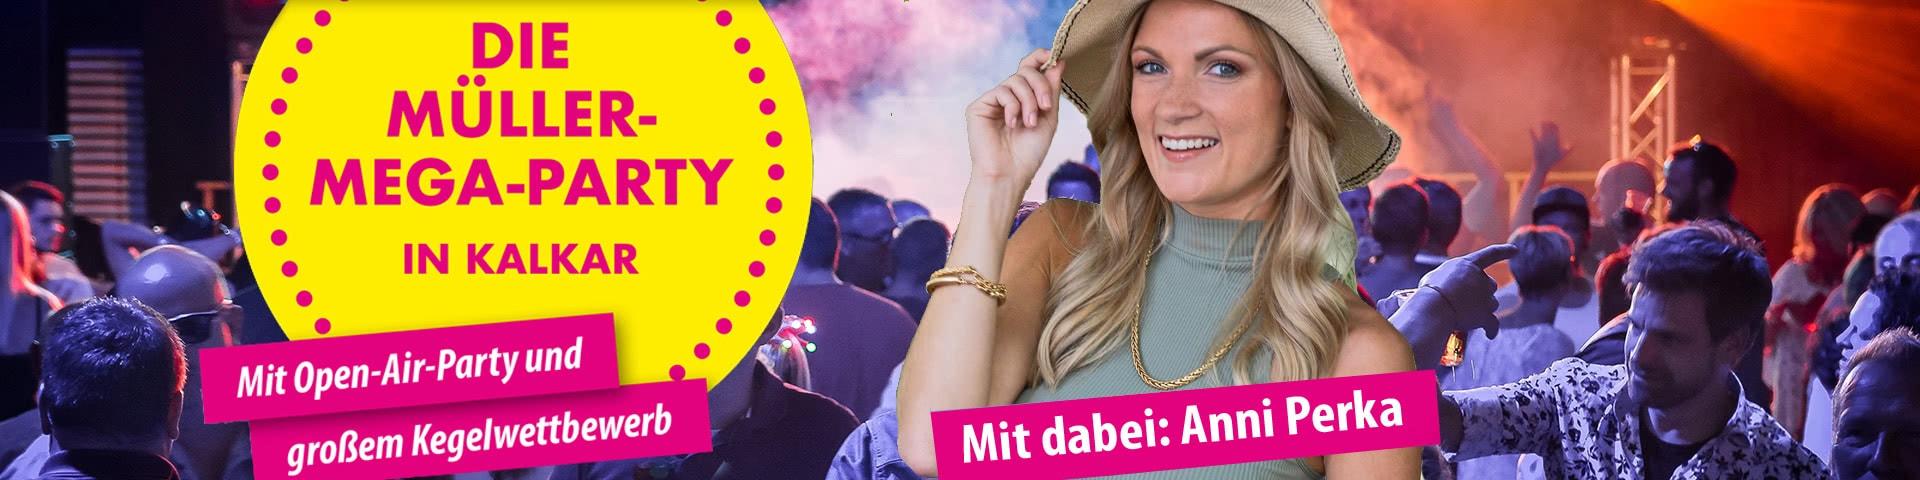 Die Müller-Mega-Party in Kalkar mit Anni Perka